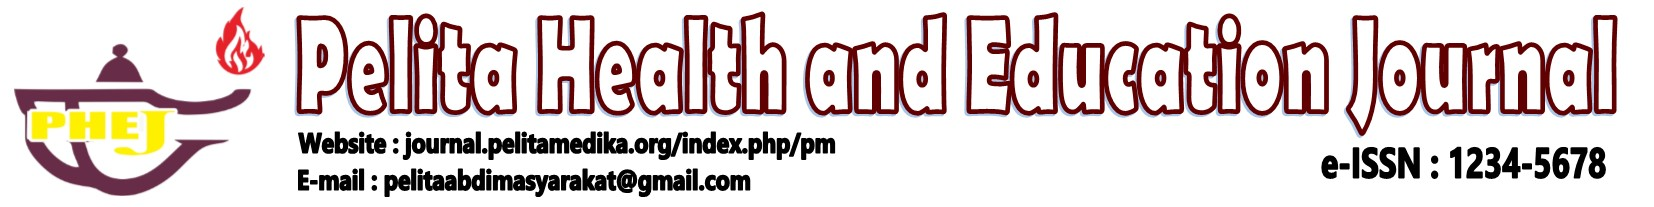 Pelita Health and Education Journal